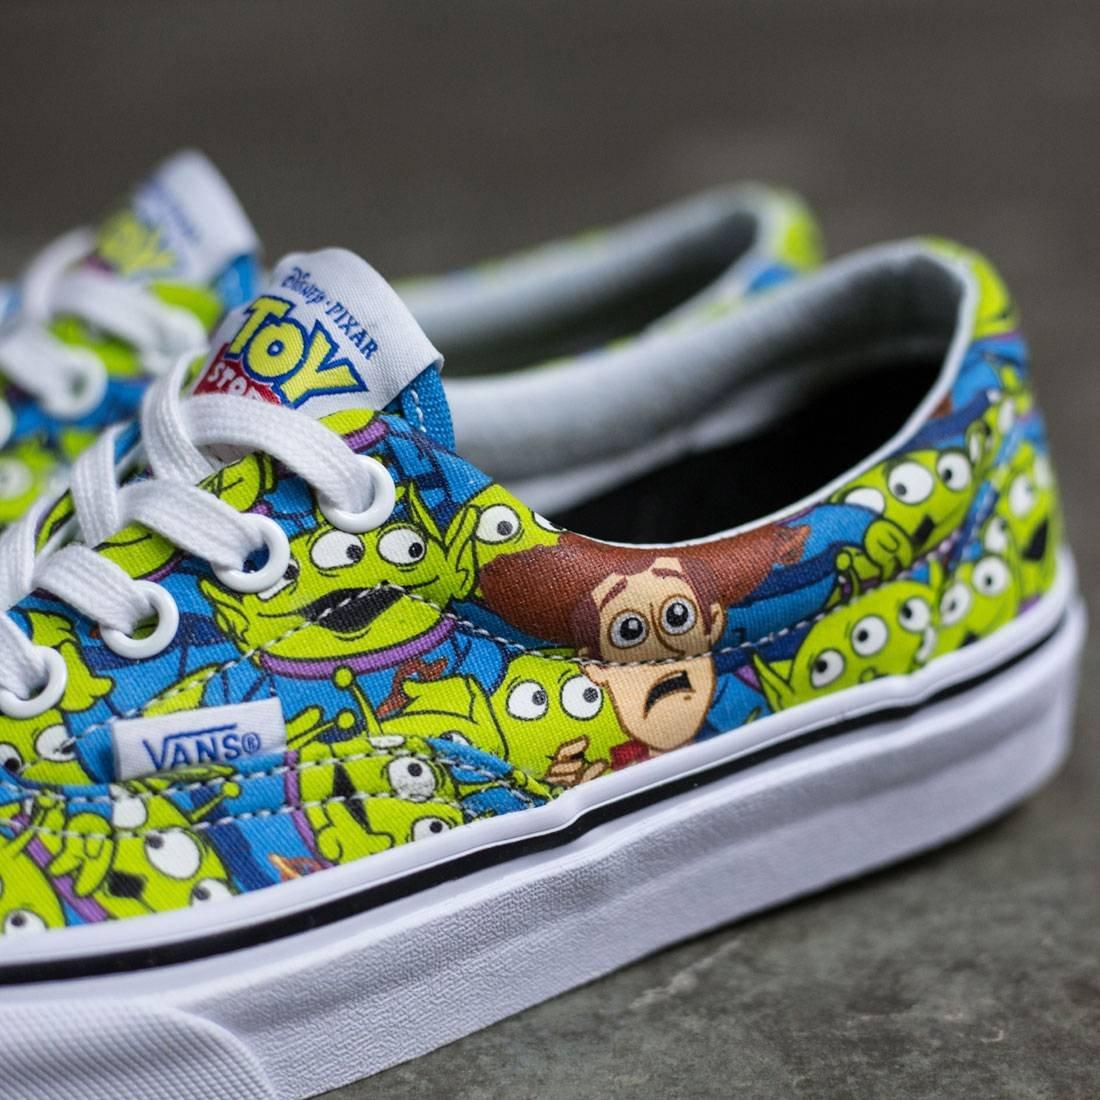 d30850bbeb Galleon - Vans Womens Era Toy Story Fashion Skateboarding Shoes Green 5.5  Medium (B